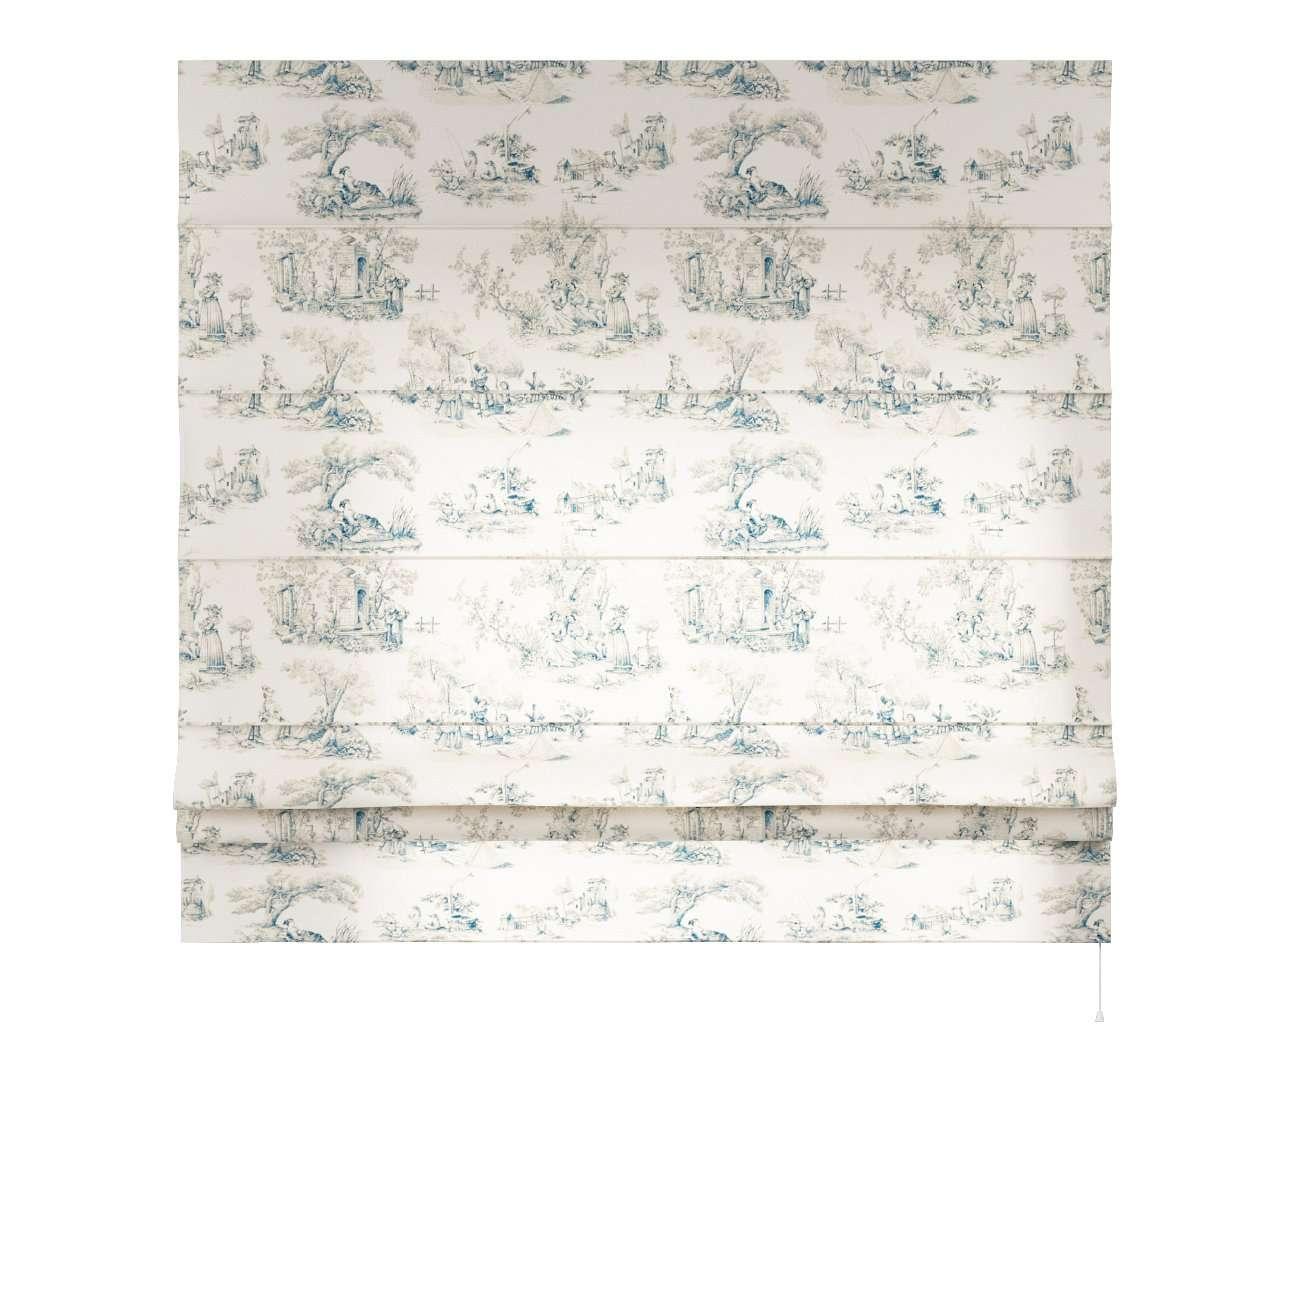 Rímska roleta Padva 80 x 170 cm V kolekcii Avinon, tkanina: 132-66